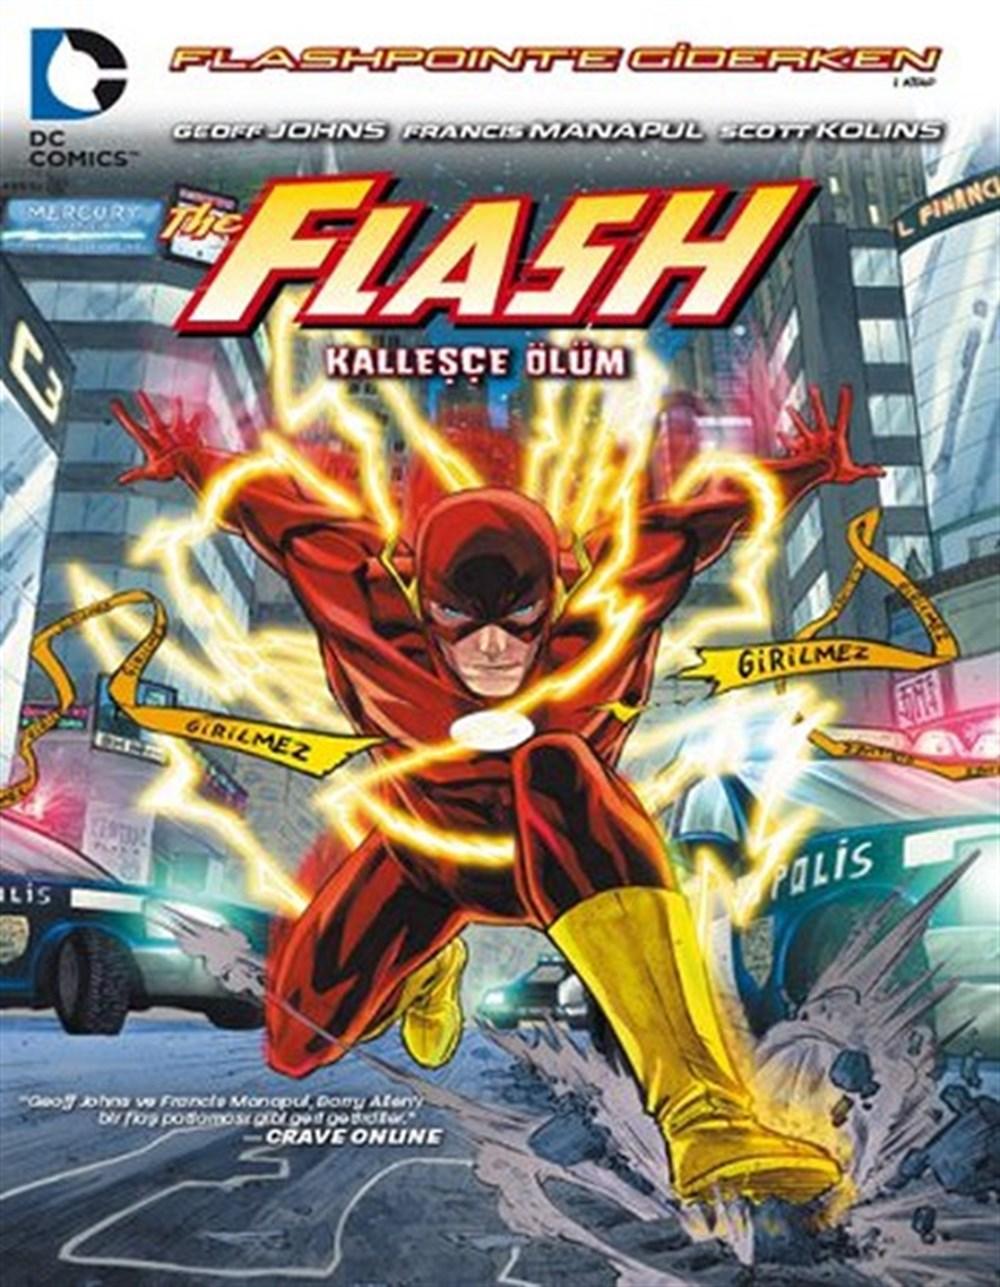 Flash: Flashpoint'e Giderken 1: Kalleşçe Ölüm